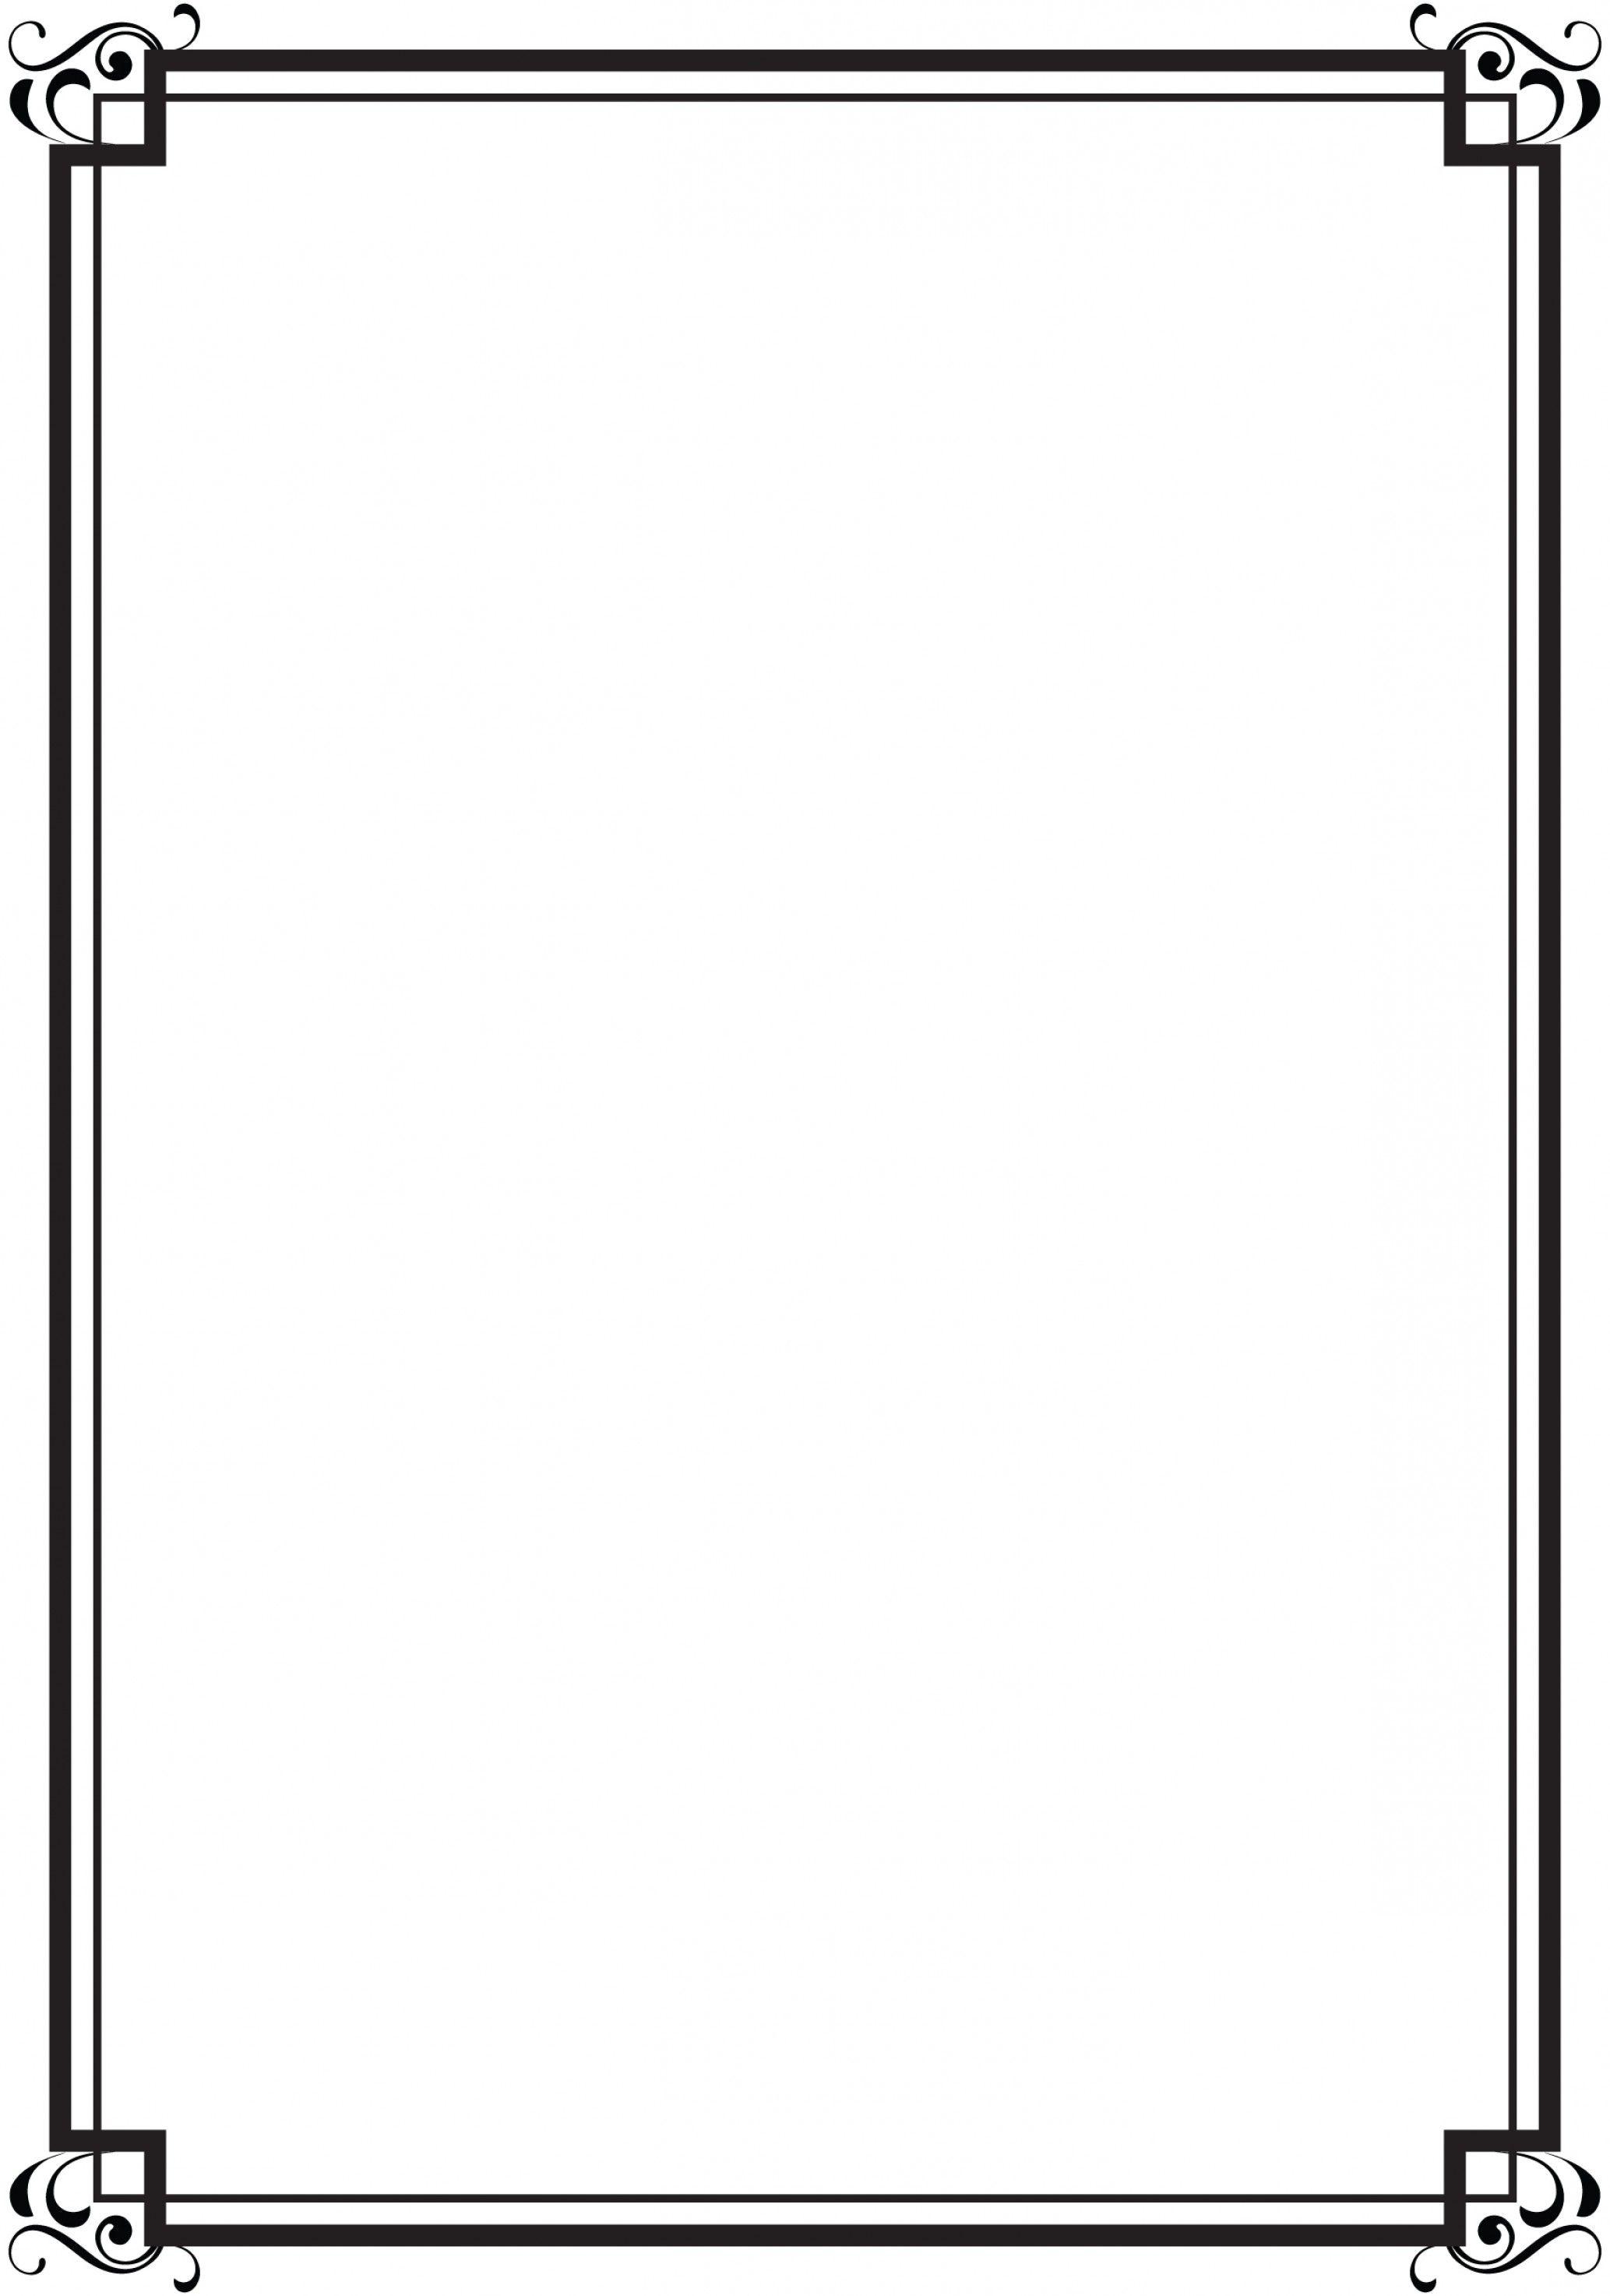 Simple Corner Borders | Free download on ClipArtMag |Desing Line Border